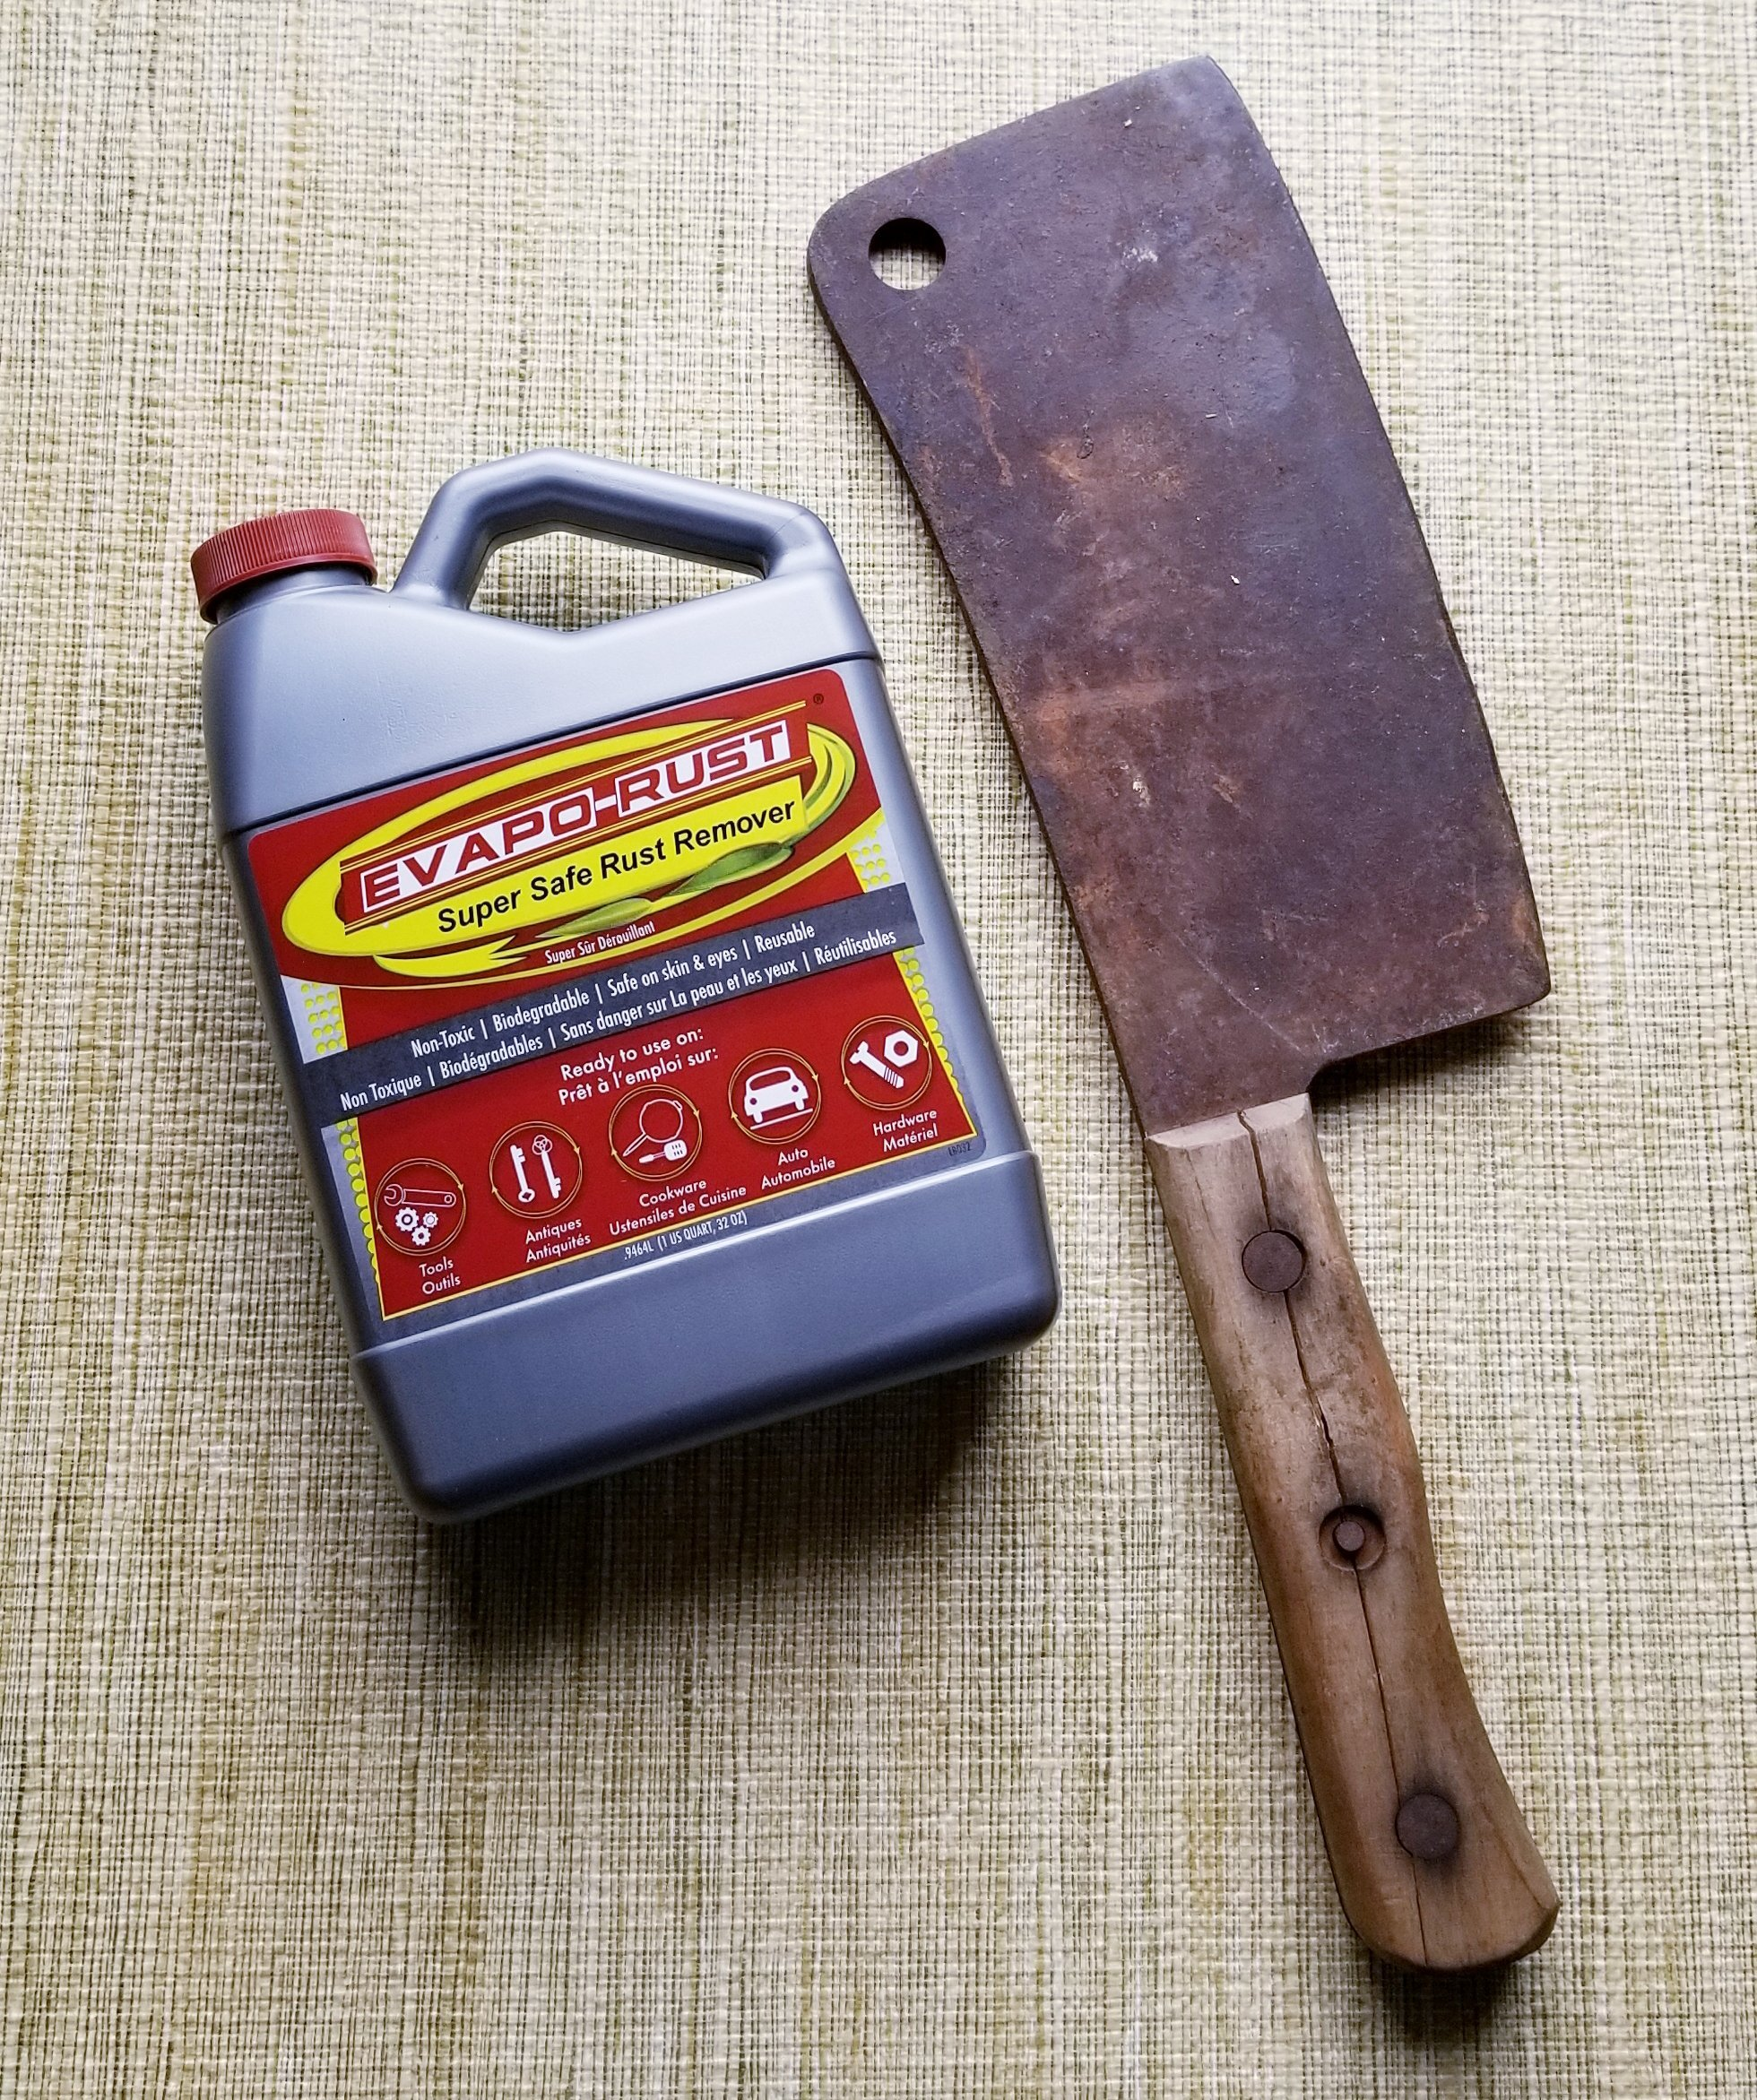 Evapo-Rust The Original Super Safe Rust Remover, Water-based, Non-Toxic, Biodegradable, 5 Gallons by Evapo-Rust (Image #5)